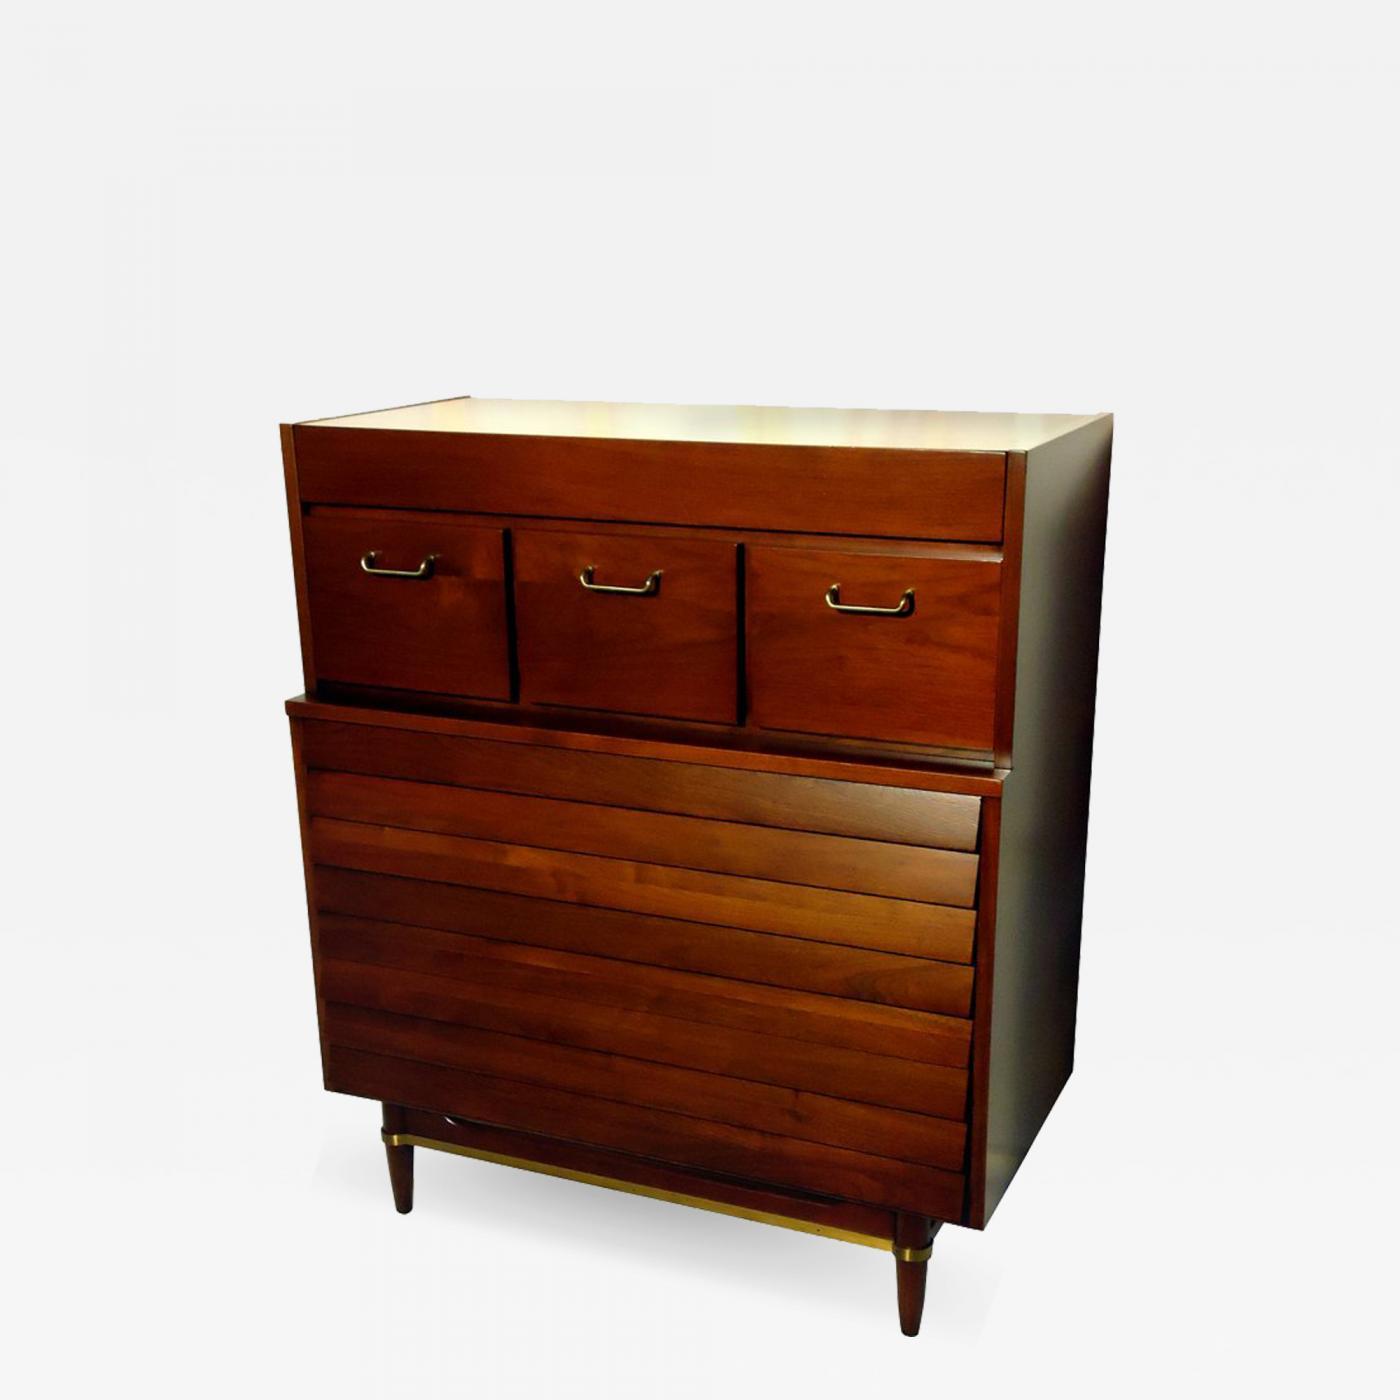 American of Martinsville - American Martinsville Walnut Dresser, circa 1955